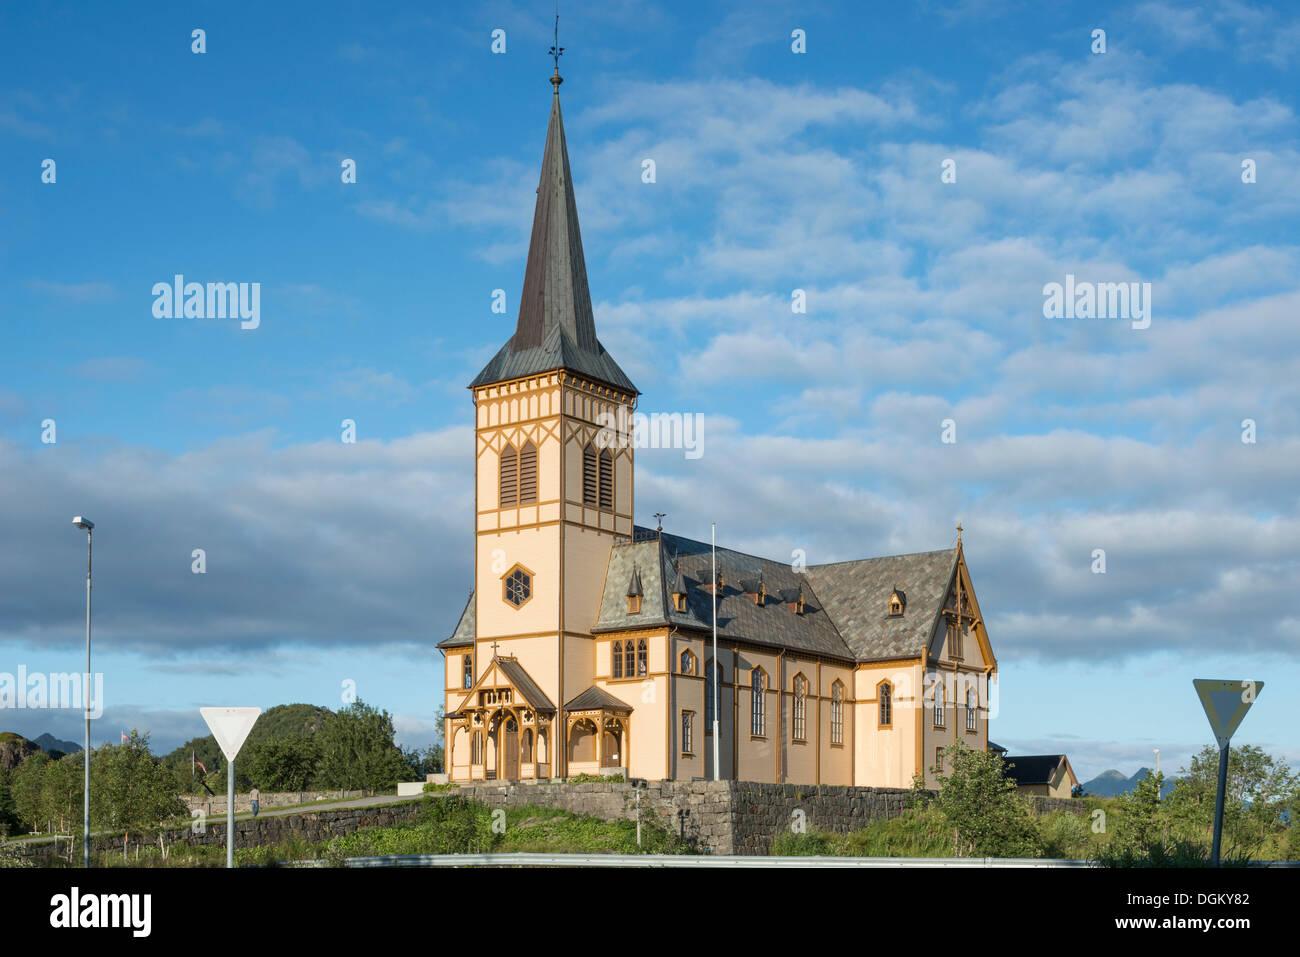 Church of Kabelvåg, Kabelvåg, Insel Vestvågøy, Lofoten, Nordland, Northern Norway, Norway - Stock Image